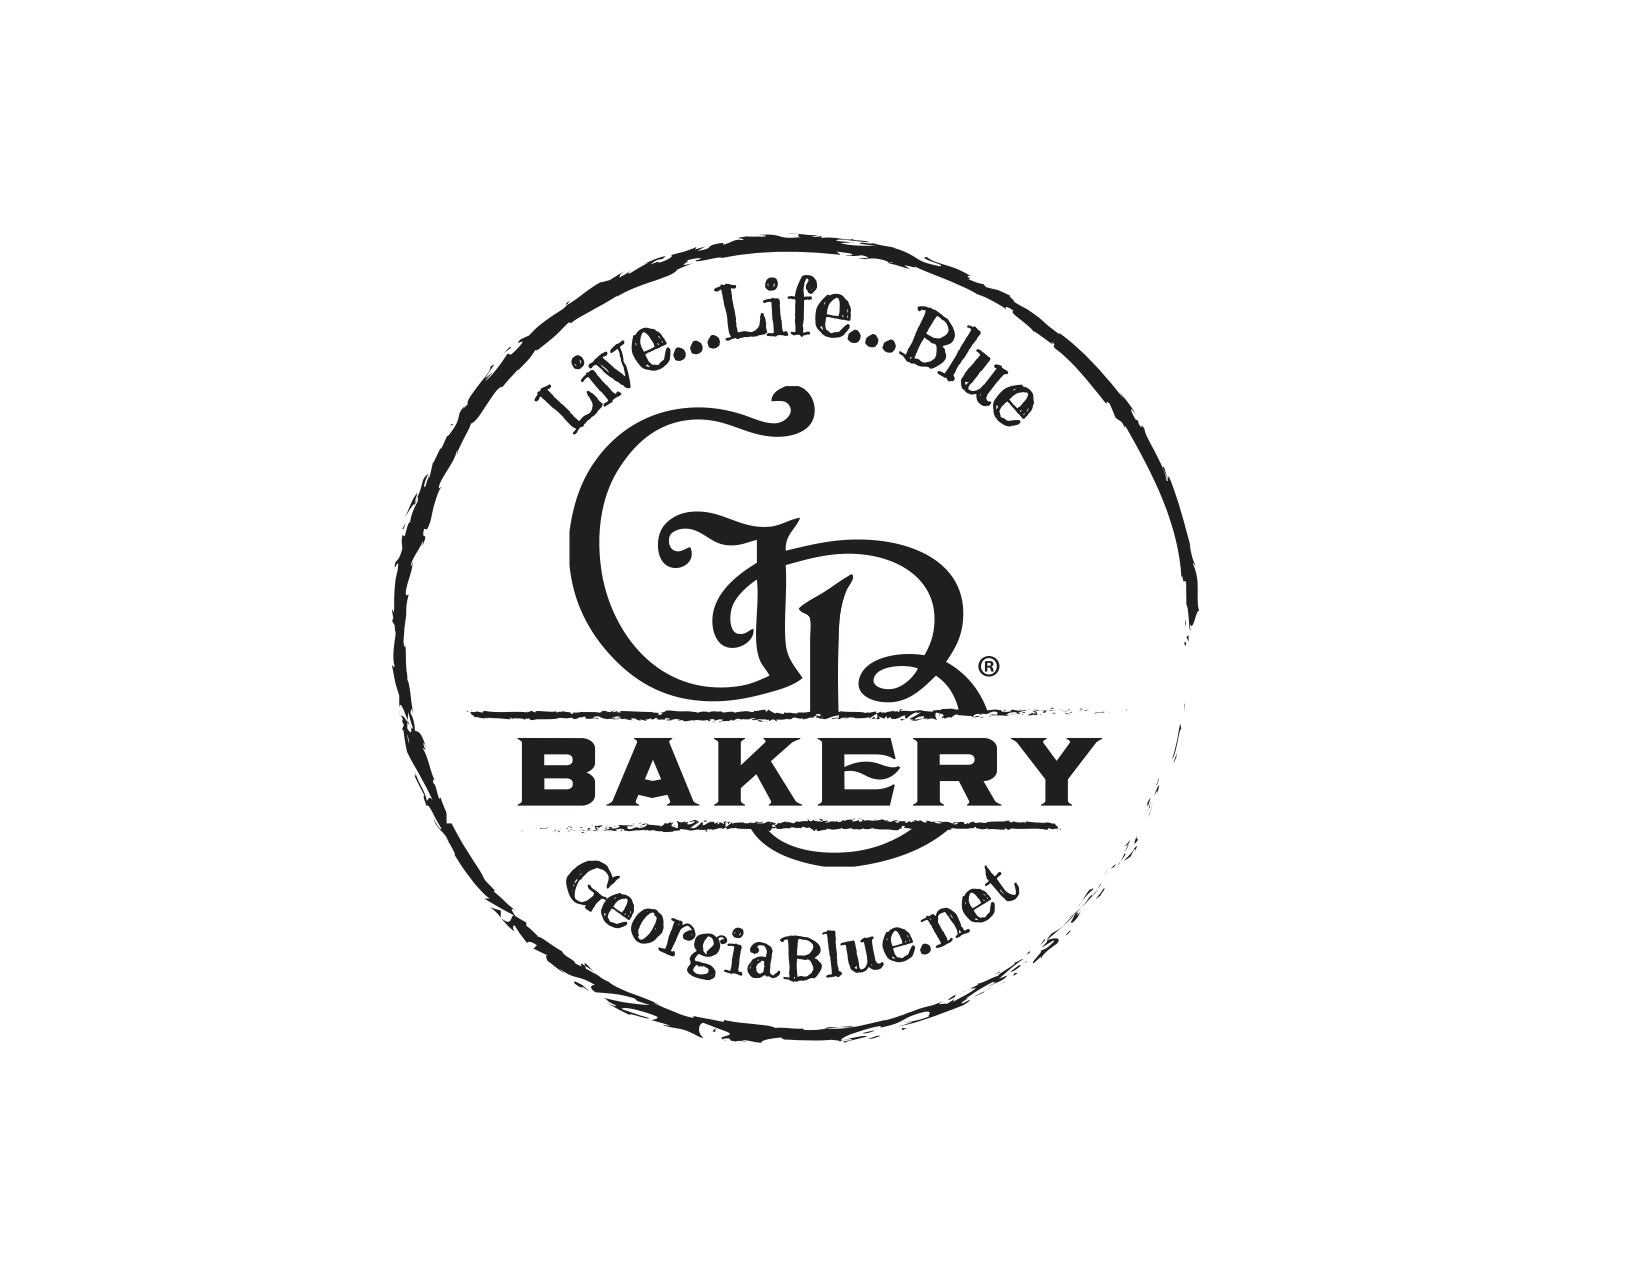 georgia blue bakery